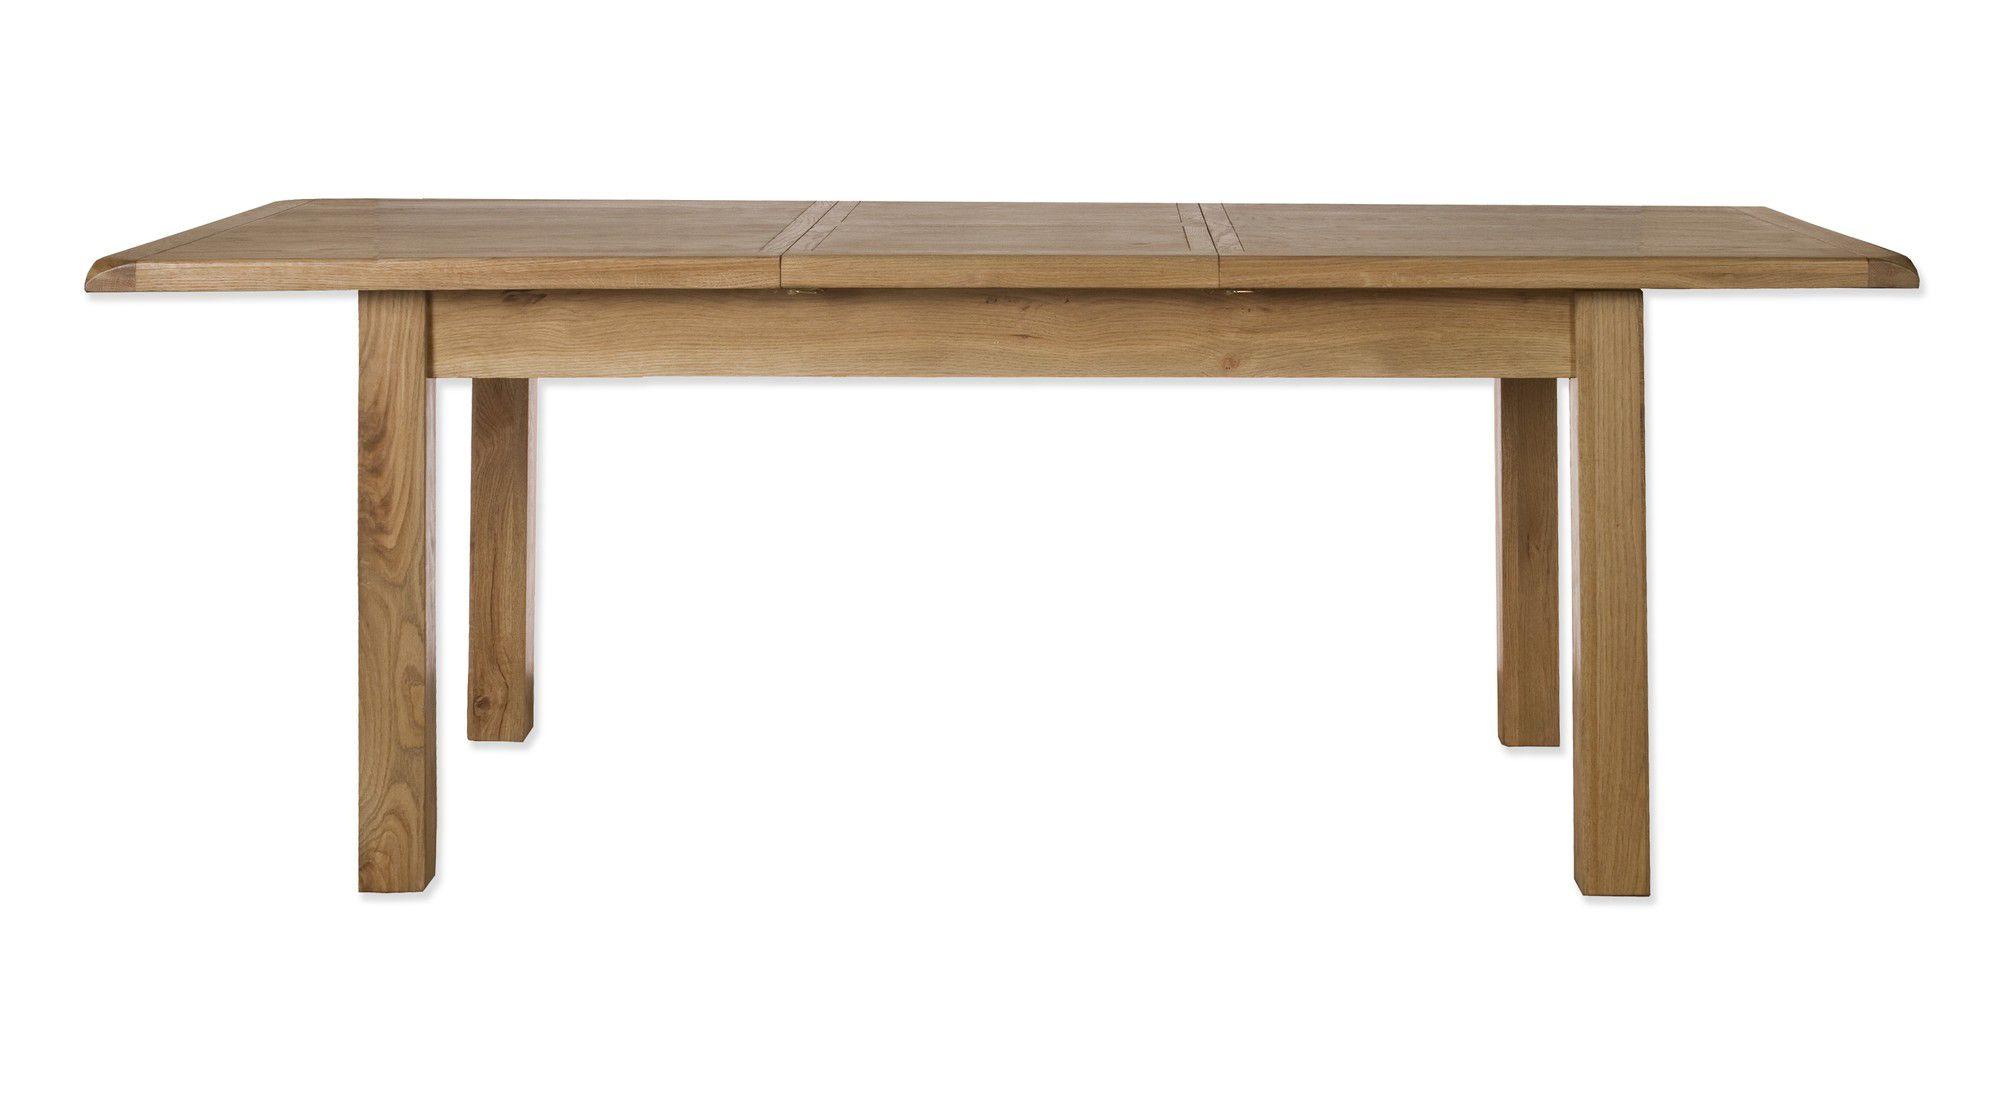 Extending Table 187 Tesco Extending Tables : 682 1495PI1000015MNwid2000amphei2000 from extendingtable.co.uk size 2000 x 2000 jpeg 91kB